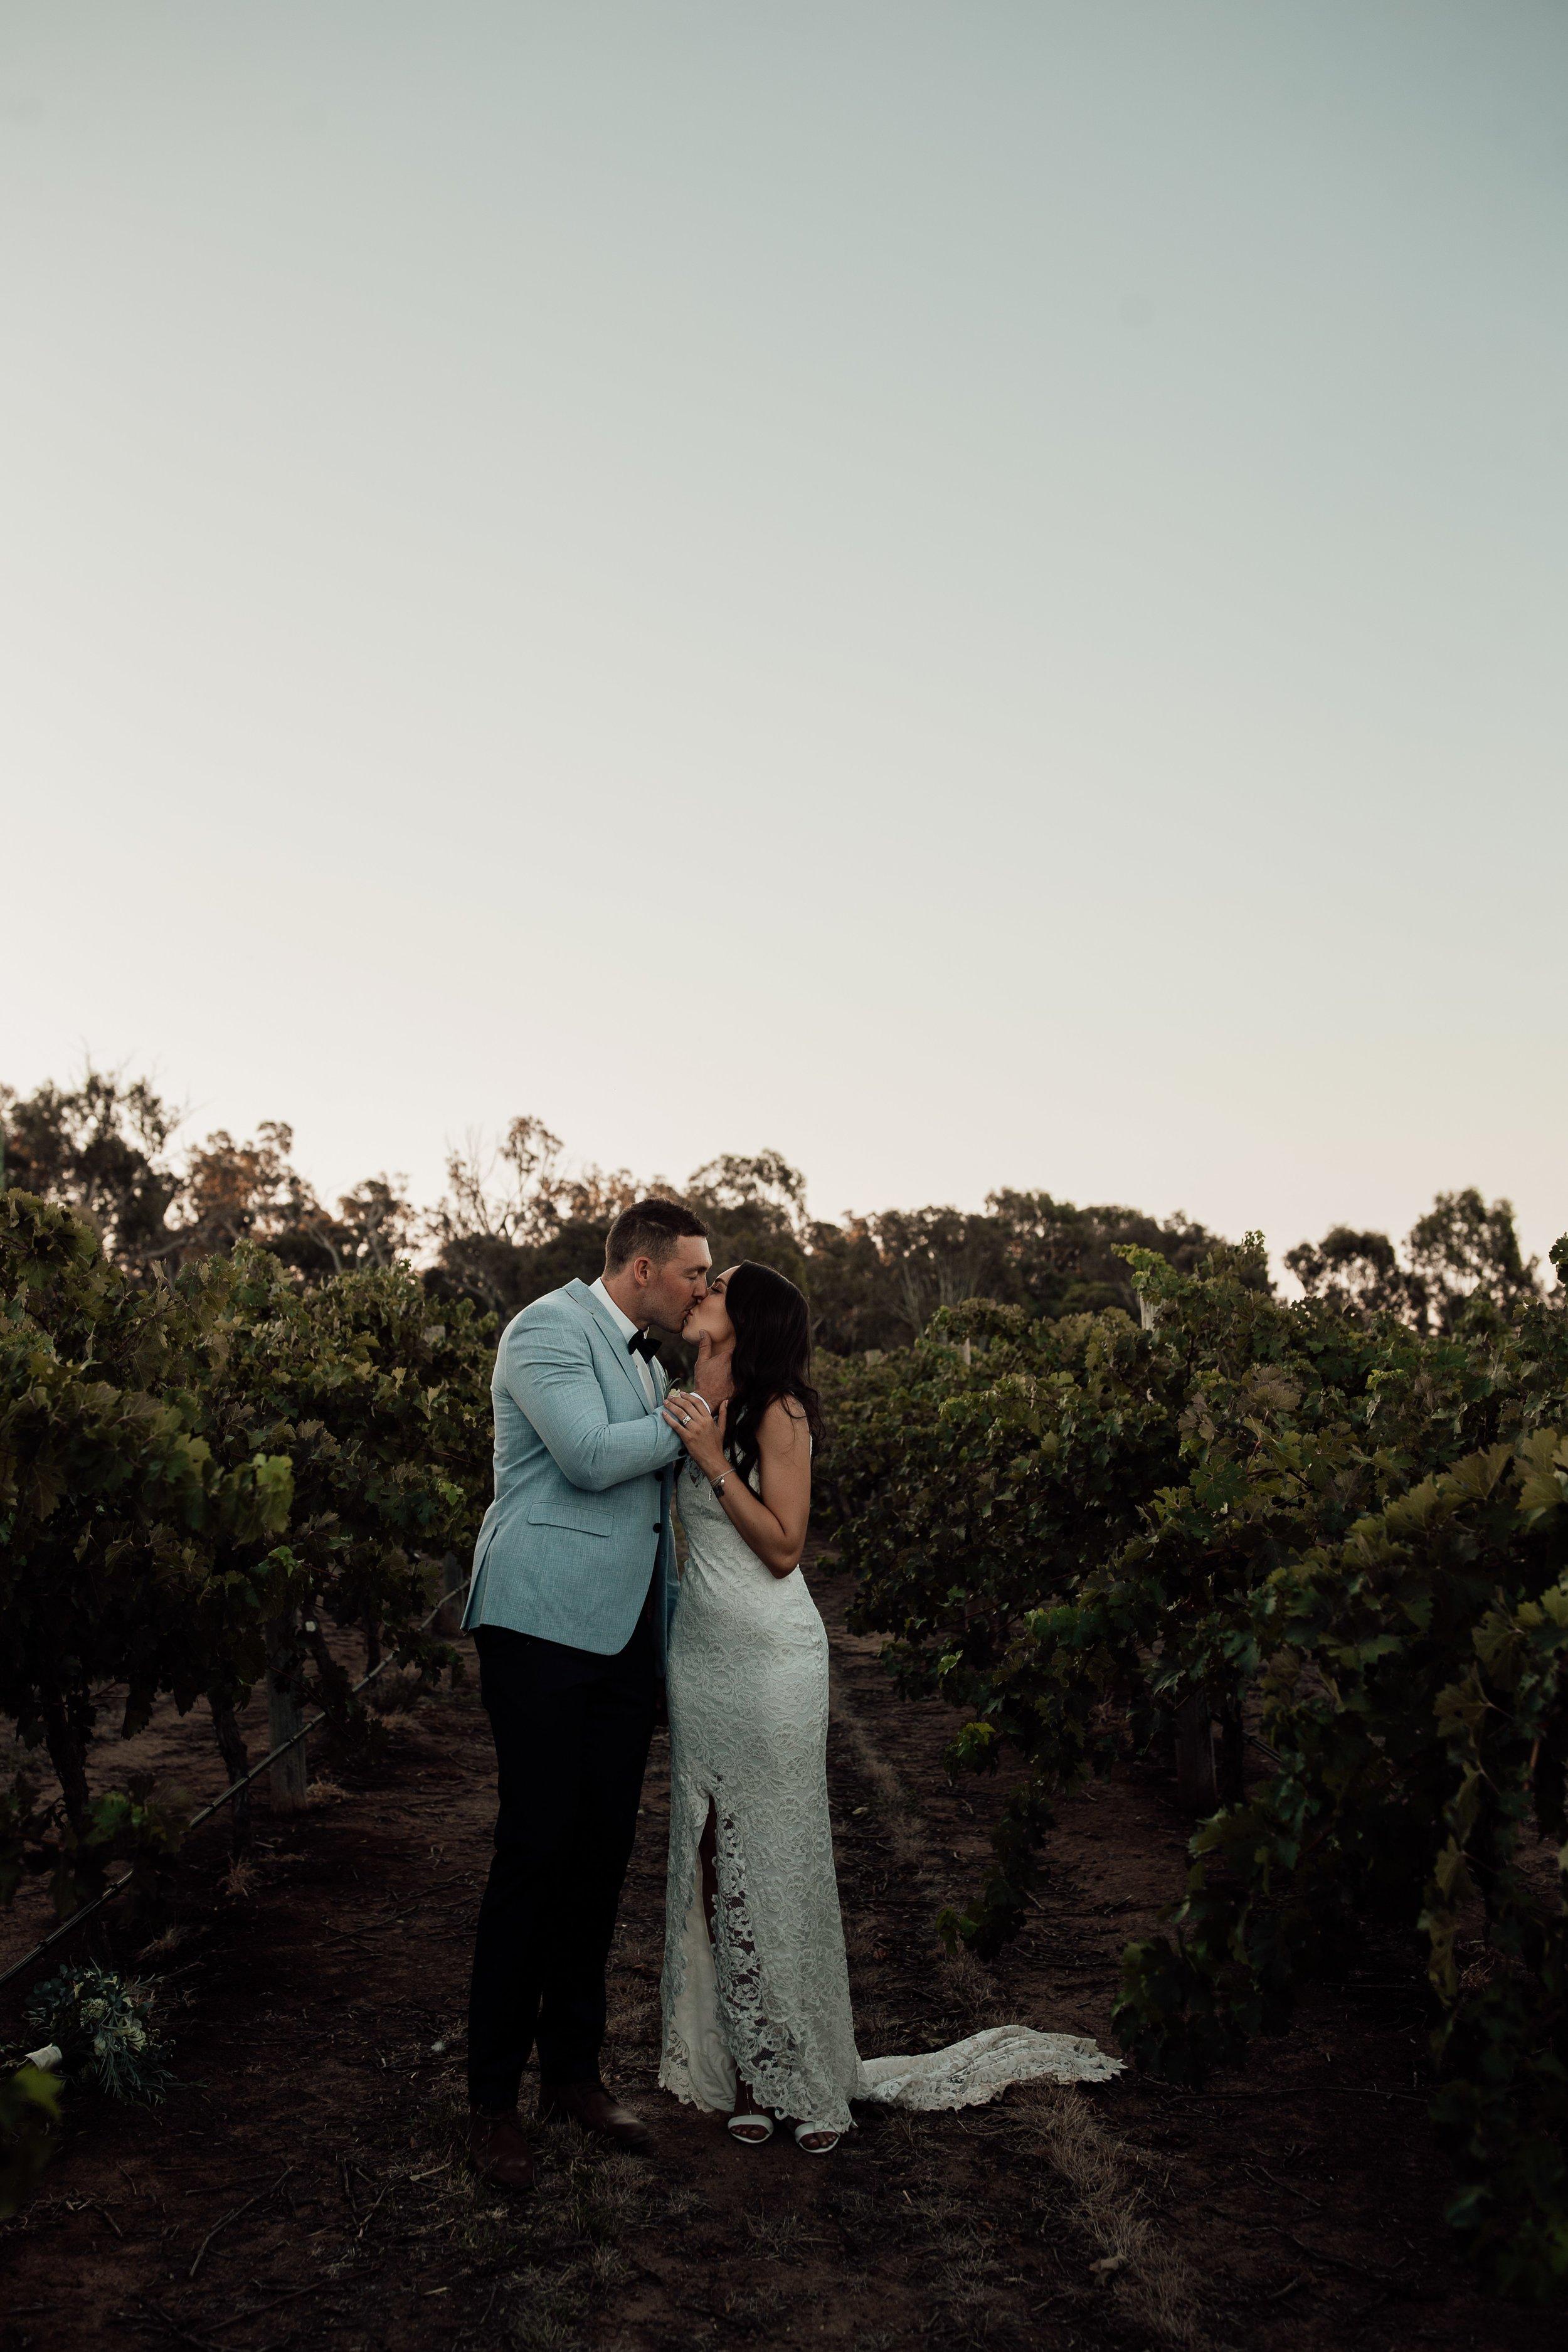 mickalathomas_puremacphotography_weddingphotographer_couplephotographer_Sheppartonphotographer_2921.jpg